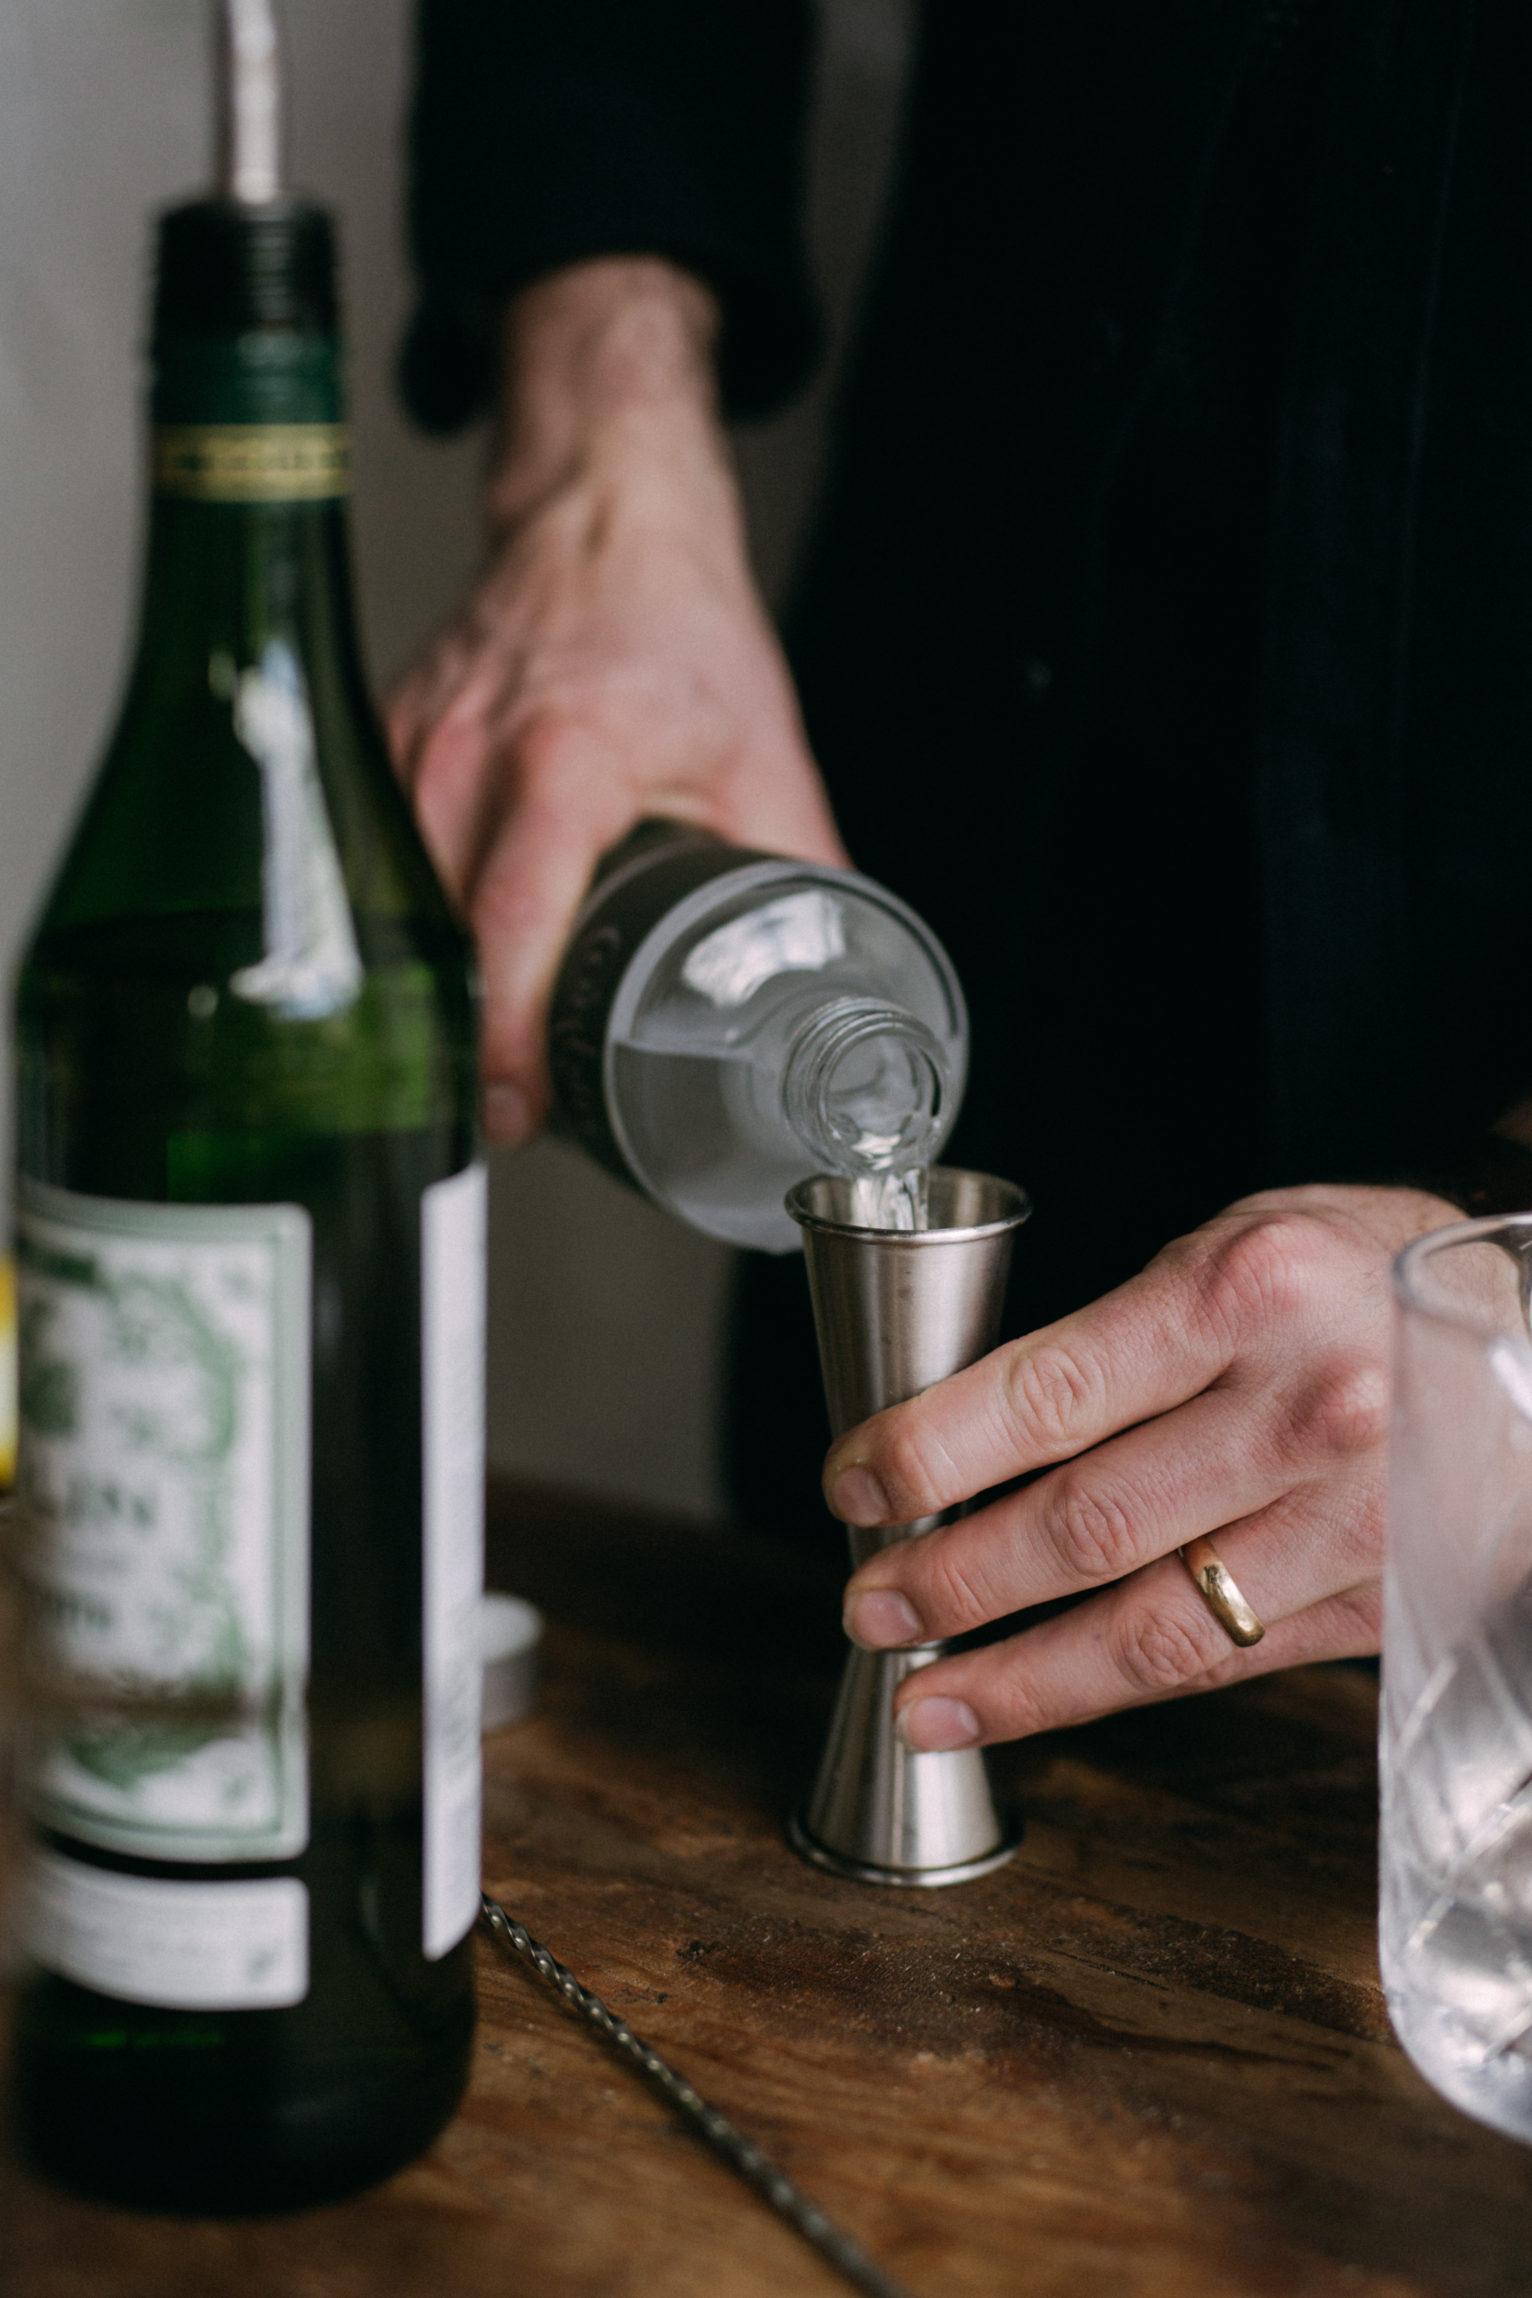 Pouring Gin into a Jigger